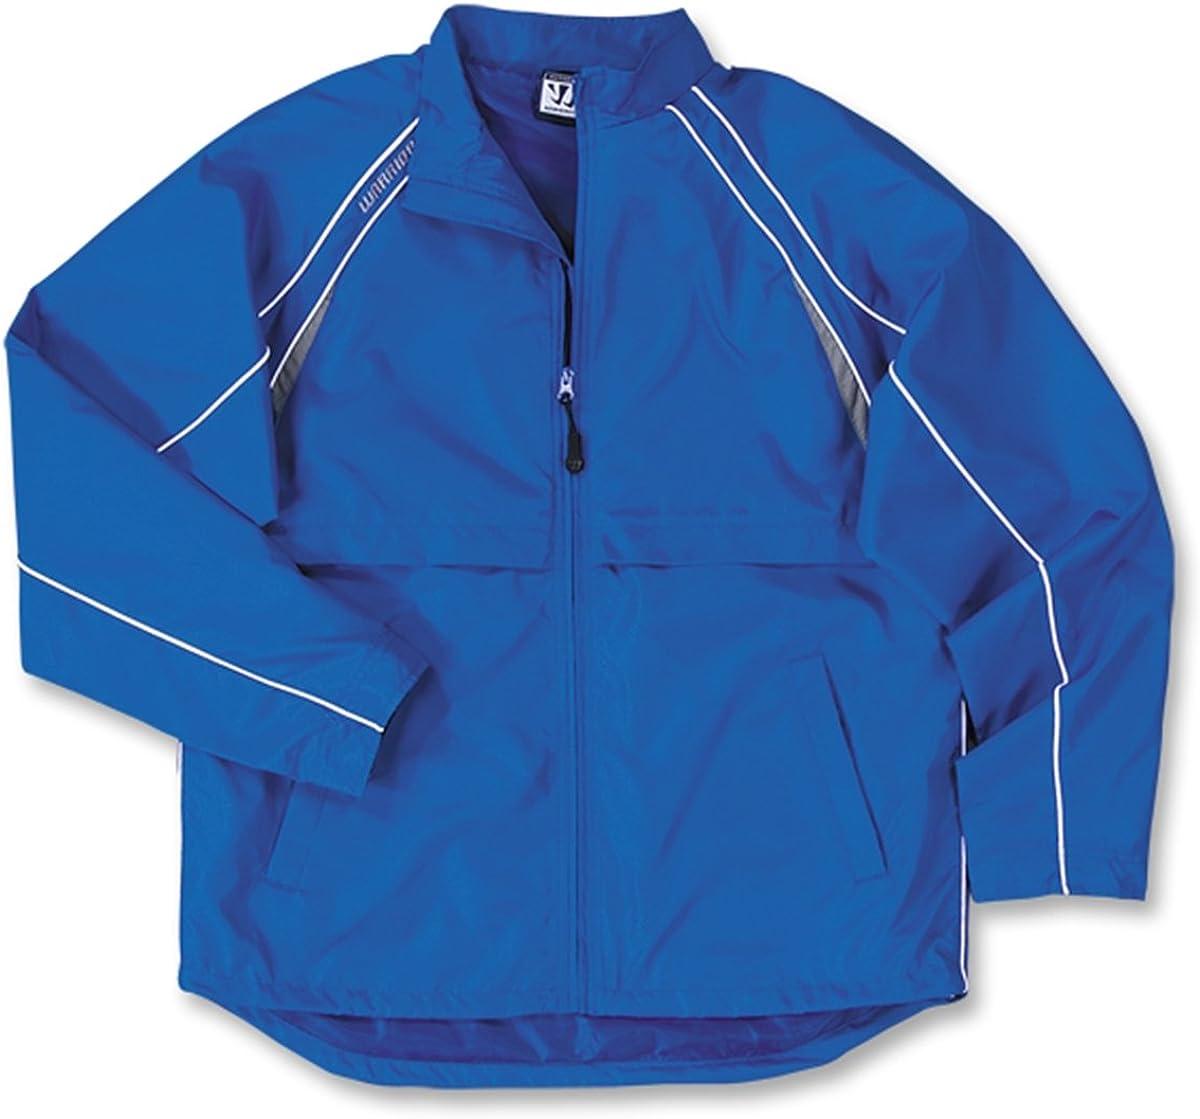 WARRIOR Royal Vision Jacket Size Medium